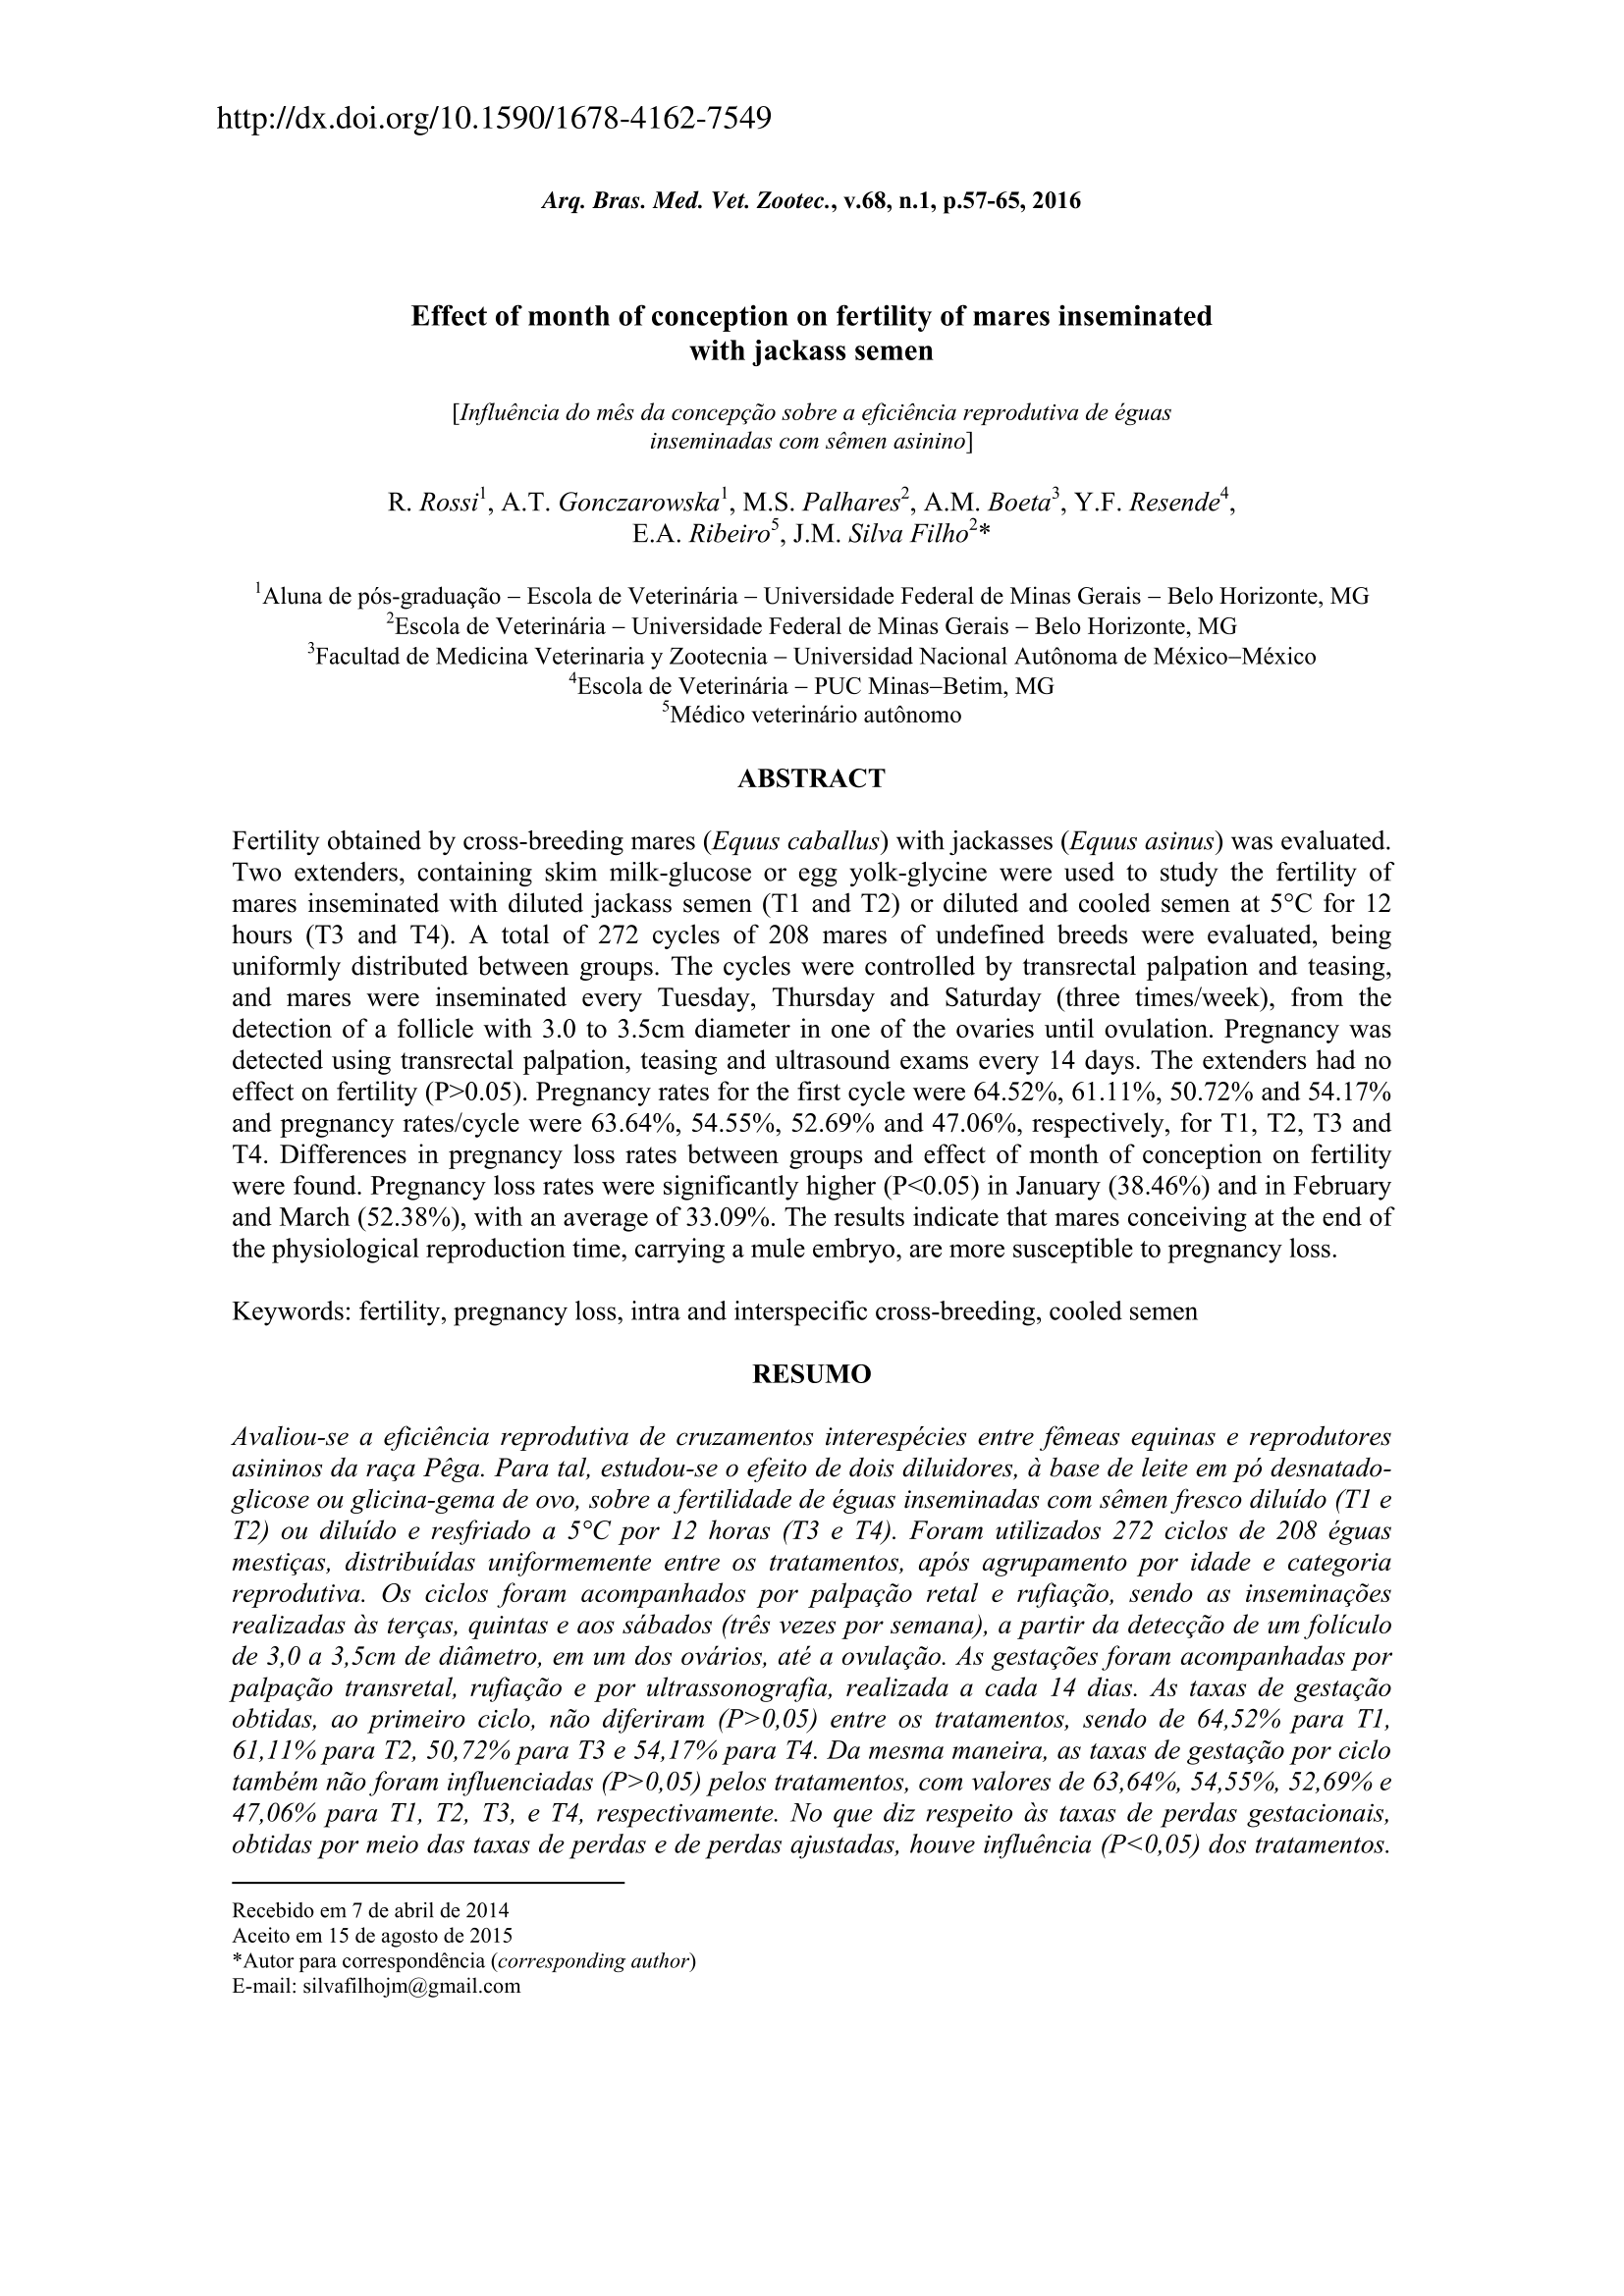 AMA 3-1 (1).png